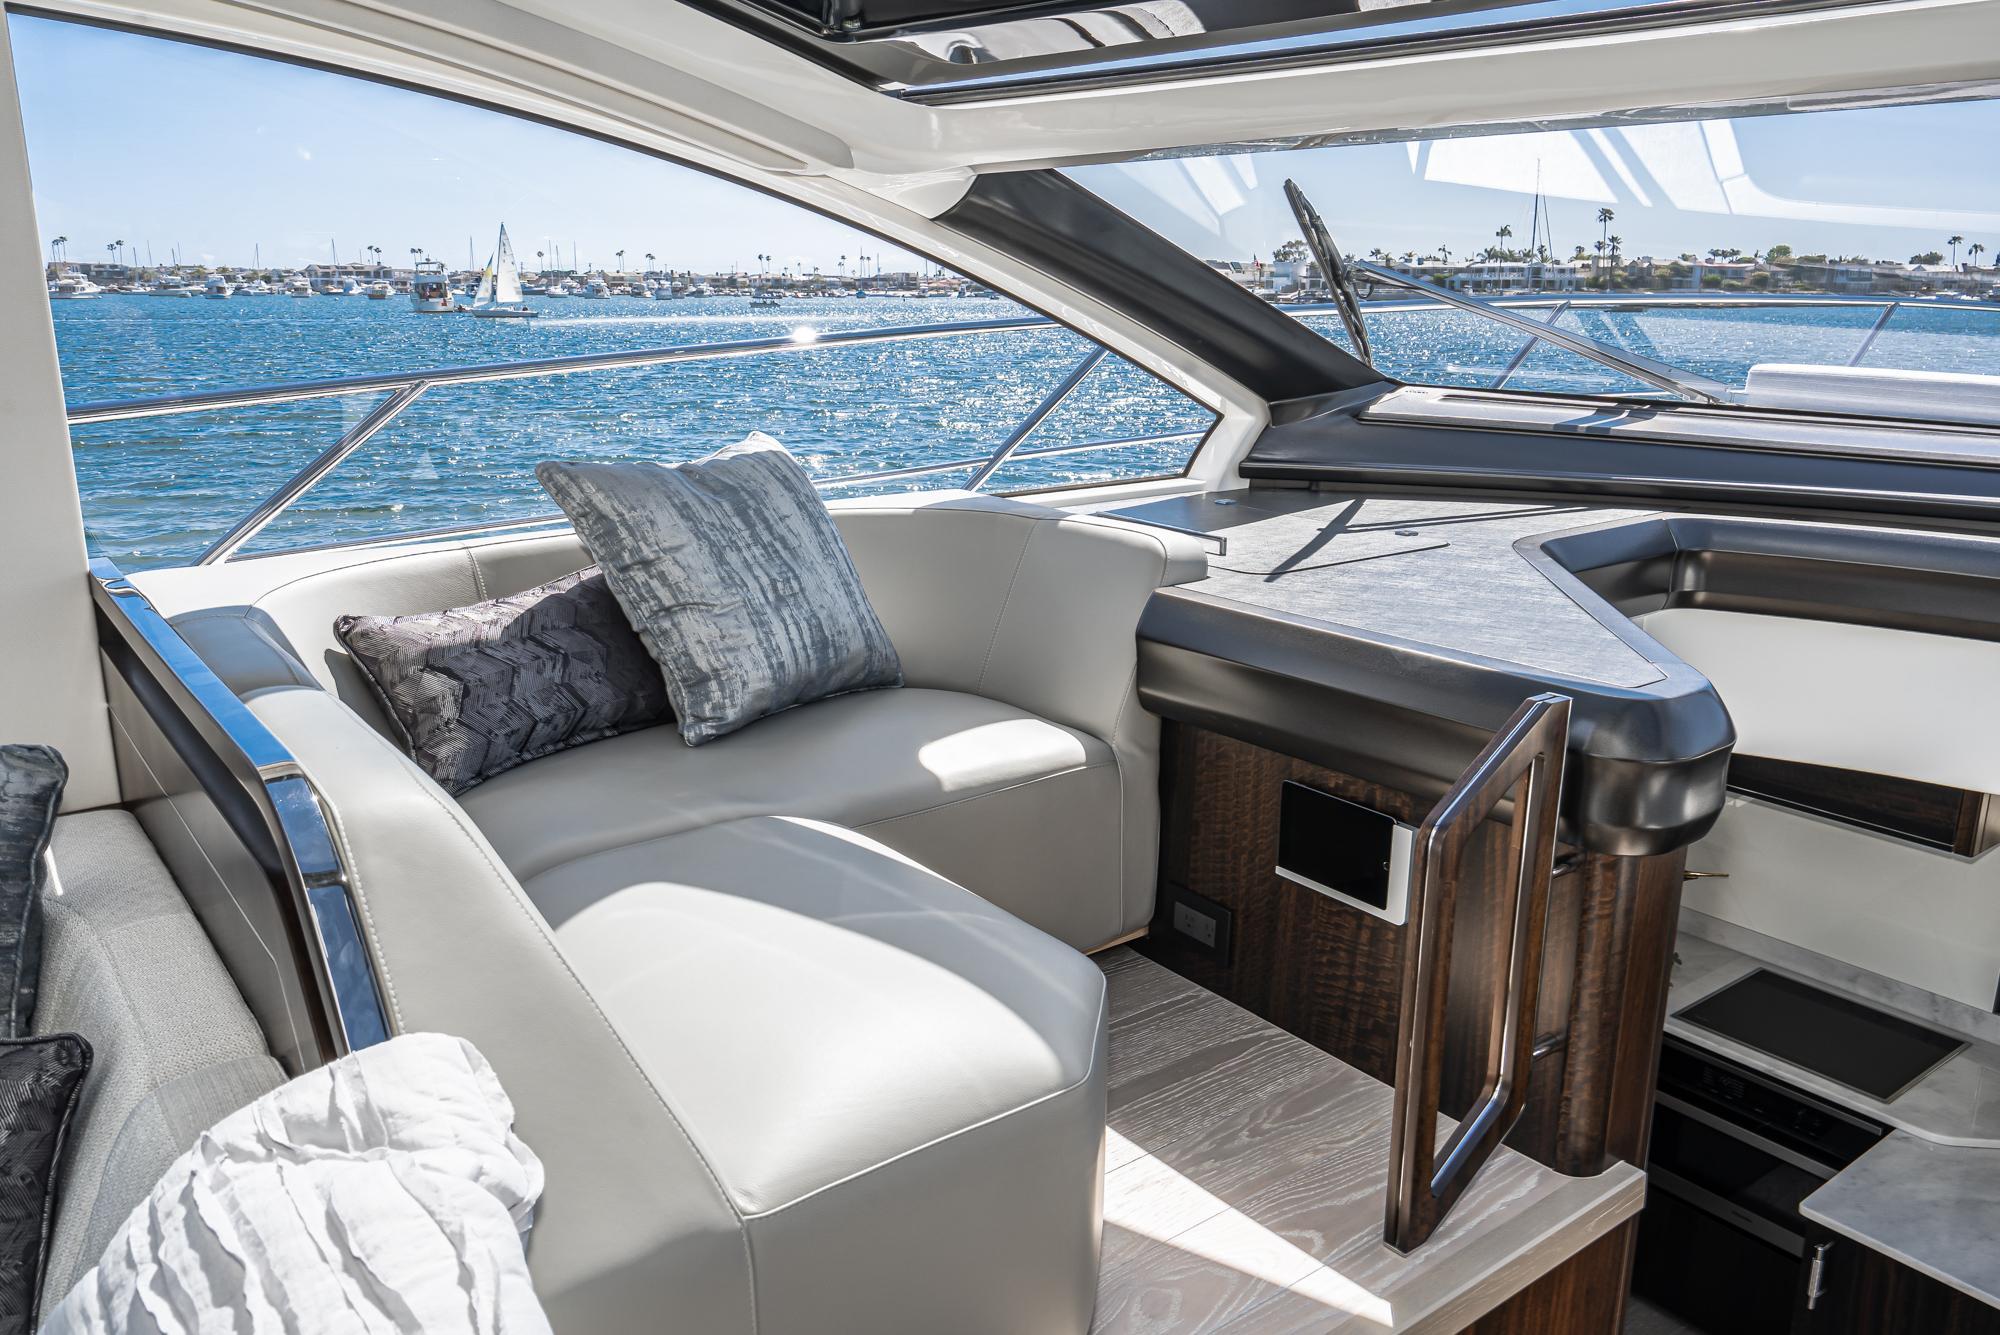 2021 Sunseeker Predator 55 EVO #SS504 inventory image at Sun Country Yachts in Newport Beach